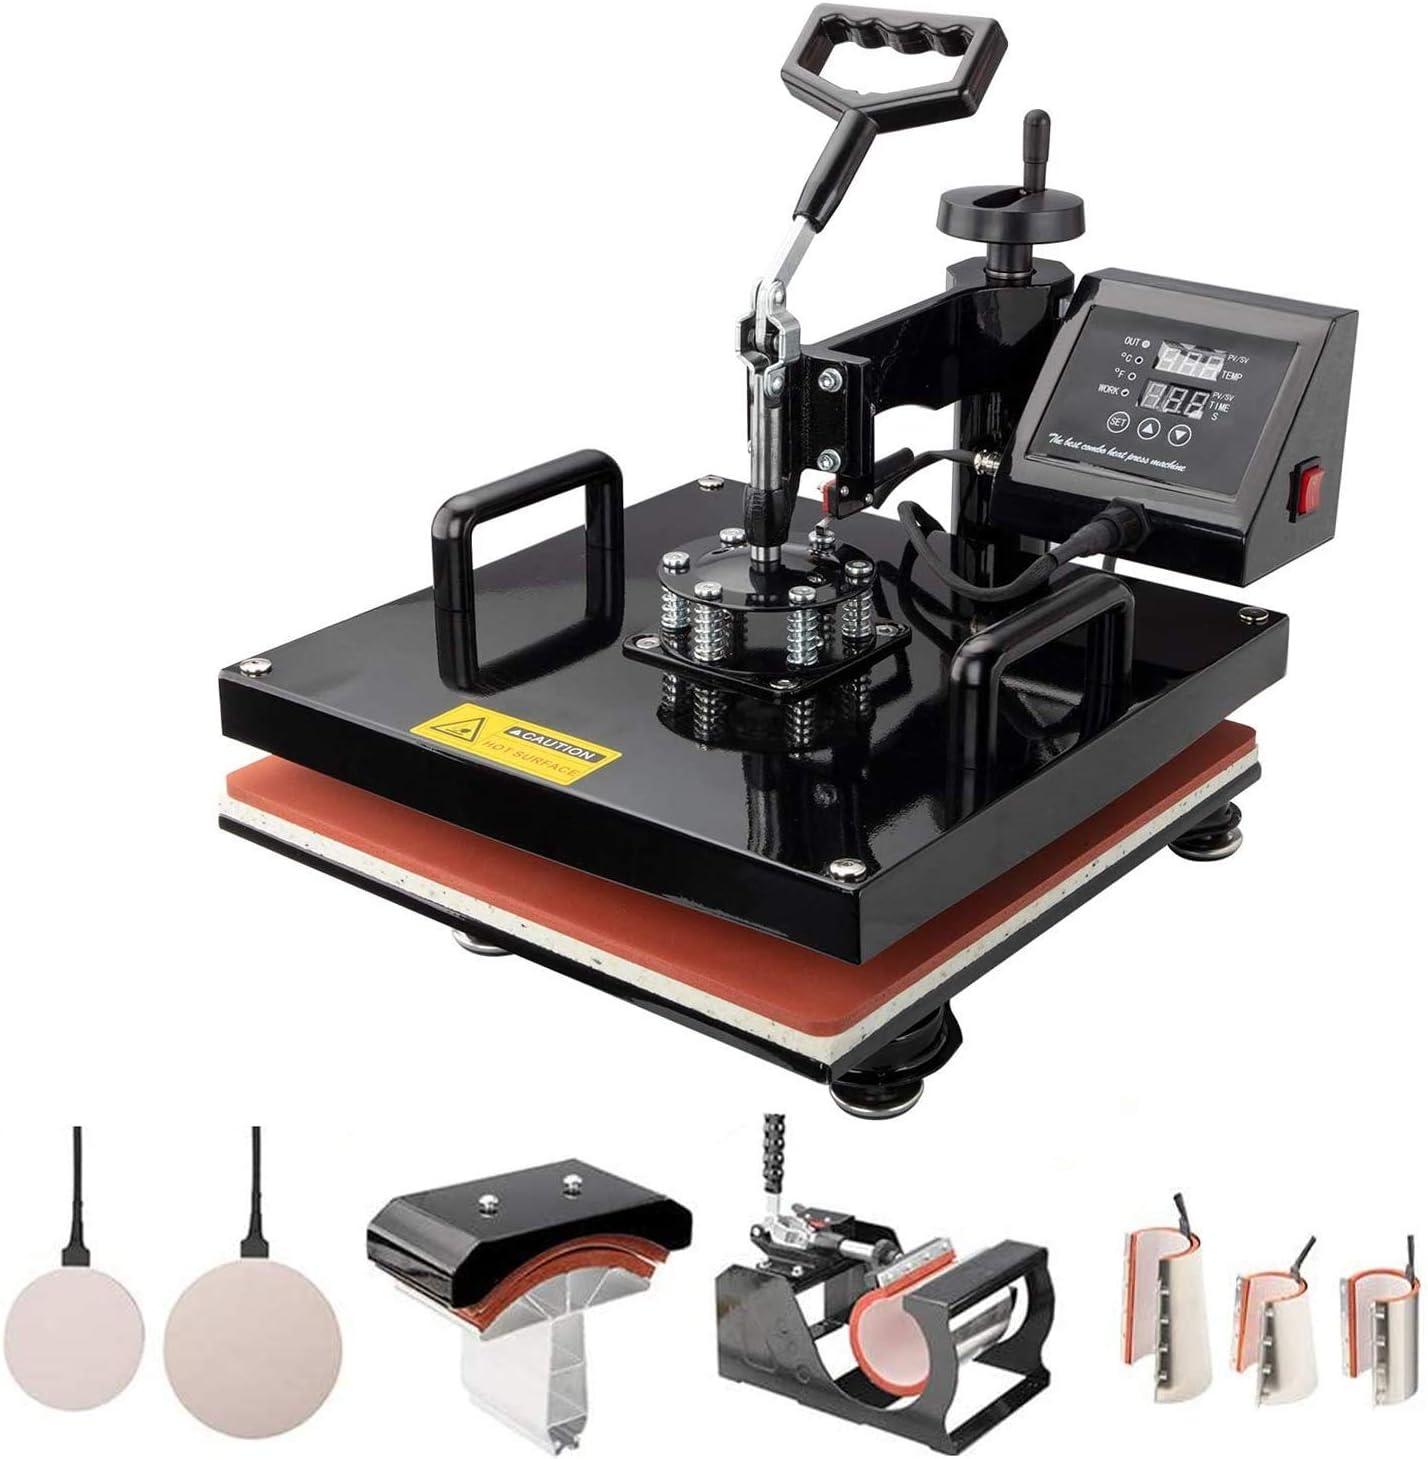 TUSY Heat Press Machine Digital Industrial Quality Printing Press Heat Transfer Machine for Hat Plate//Cap//T Shirt 15x15 inch